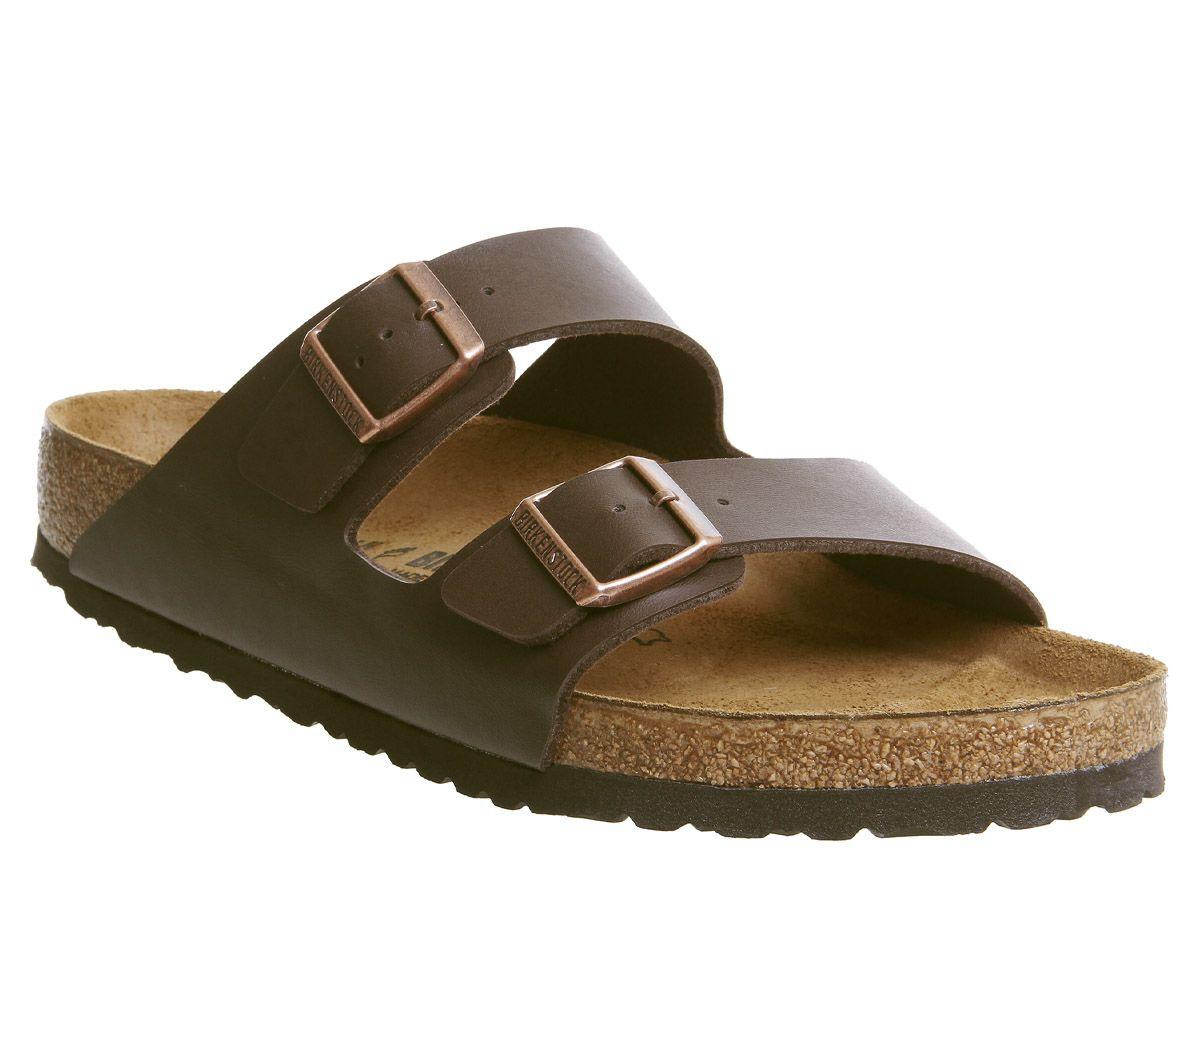 35577ceb3fad Birkenstock Arizona Two Strap Sandals Brown - Sandals